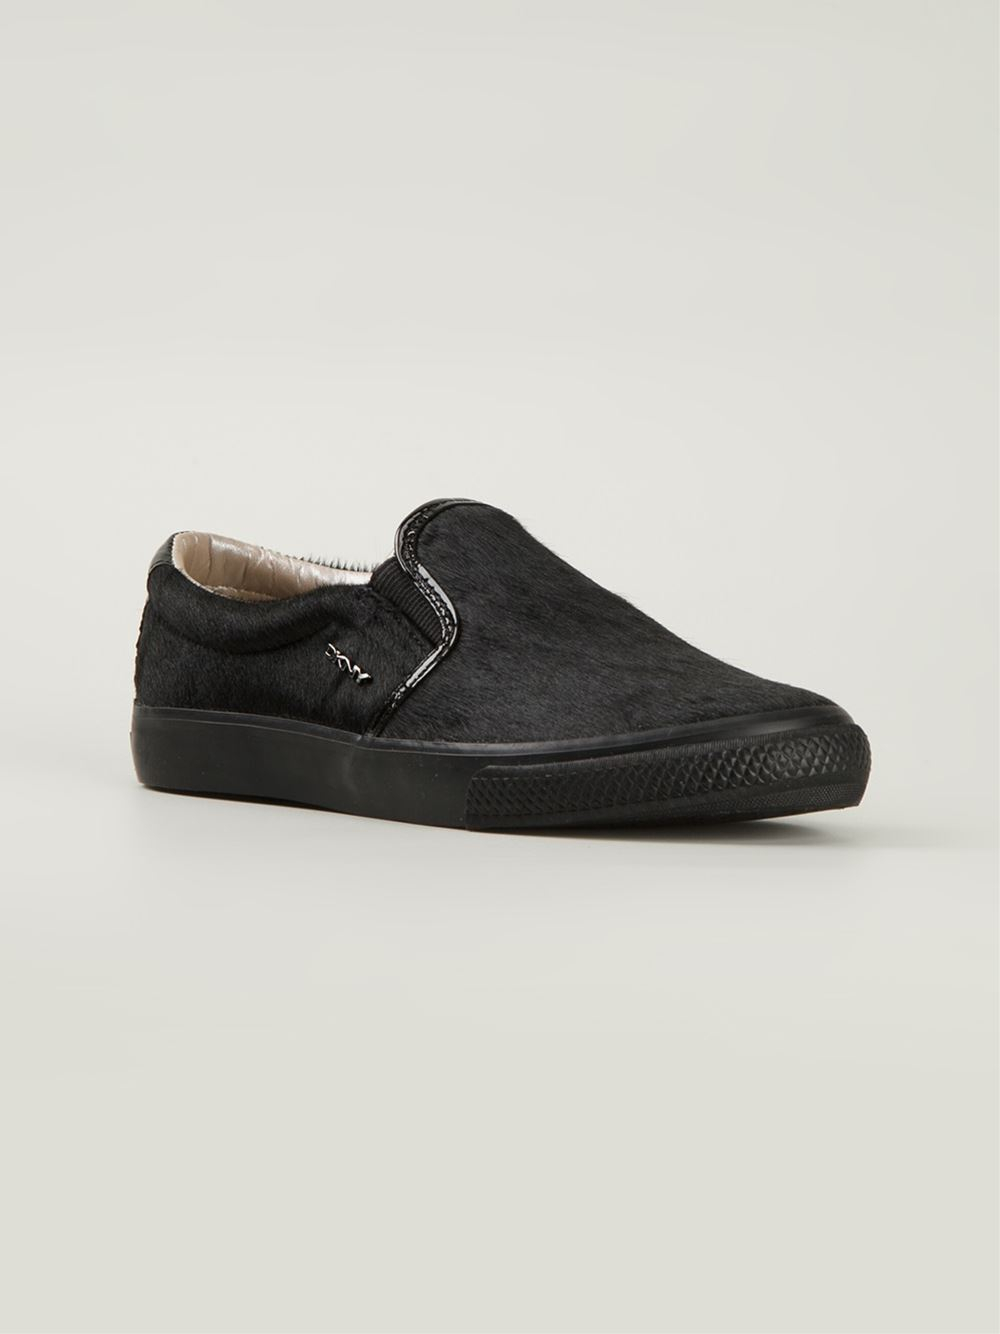 Lyst Dkny Slip On Sneakers In Black